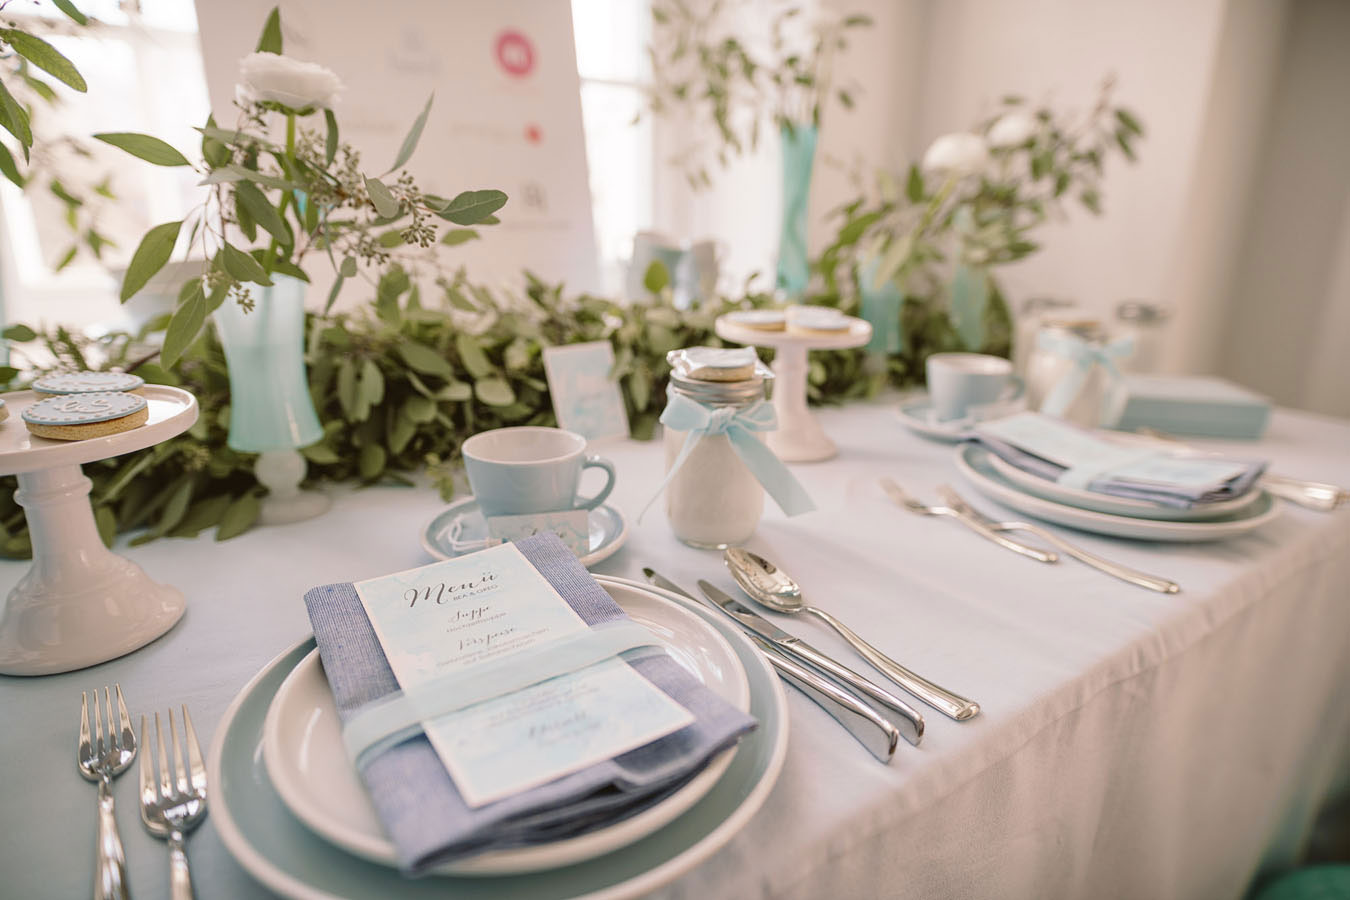 Sylt Aquarell Hochzeitspapeterie - Menü